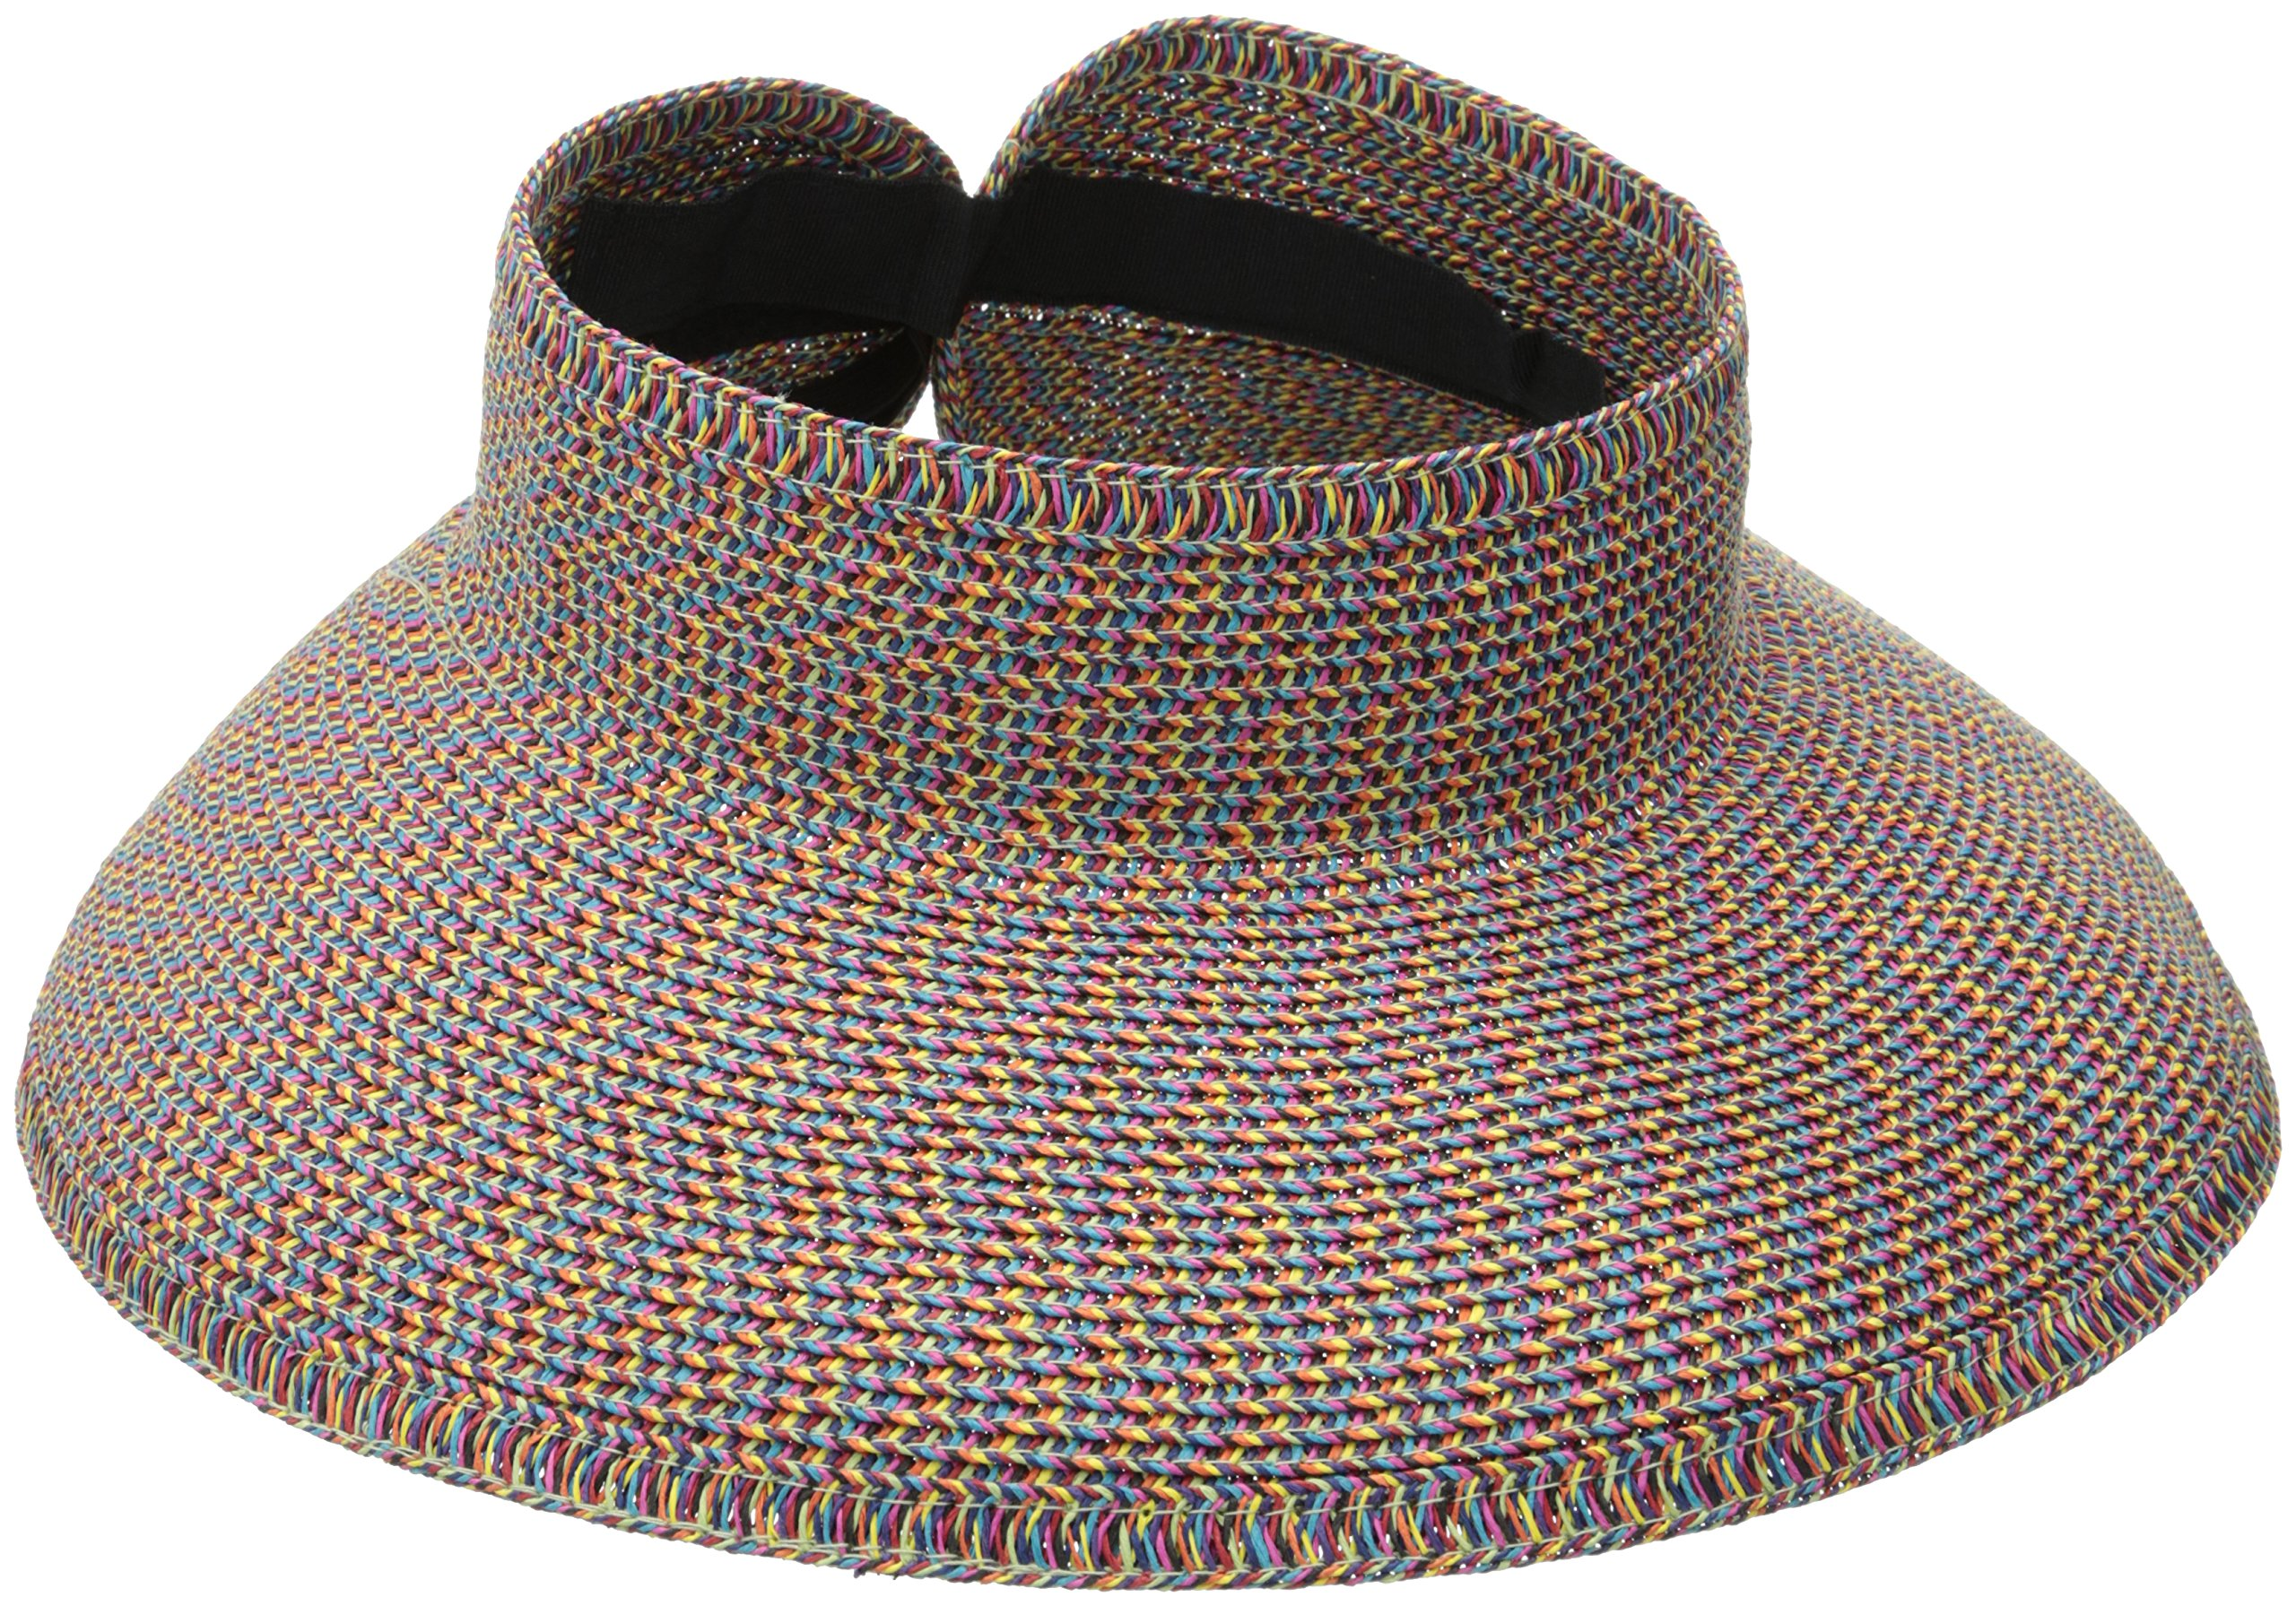 San Diego Hat Company Women's Visor, Bright, One Size by San Diego Hat Company (Image #1)